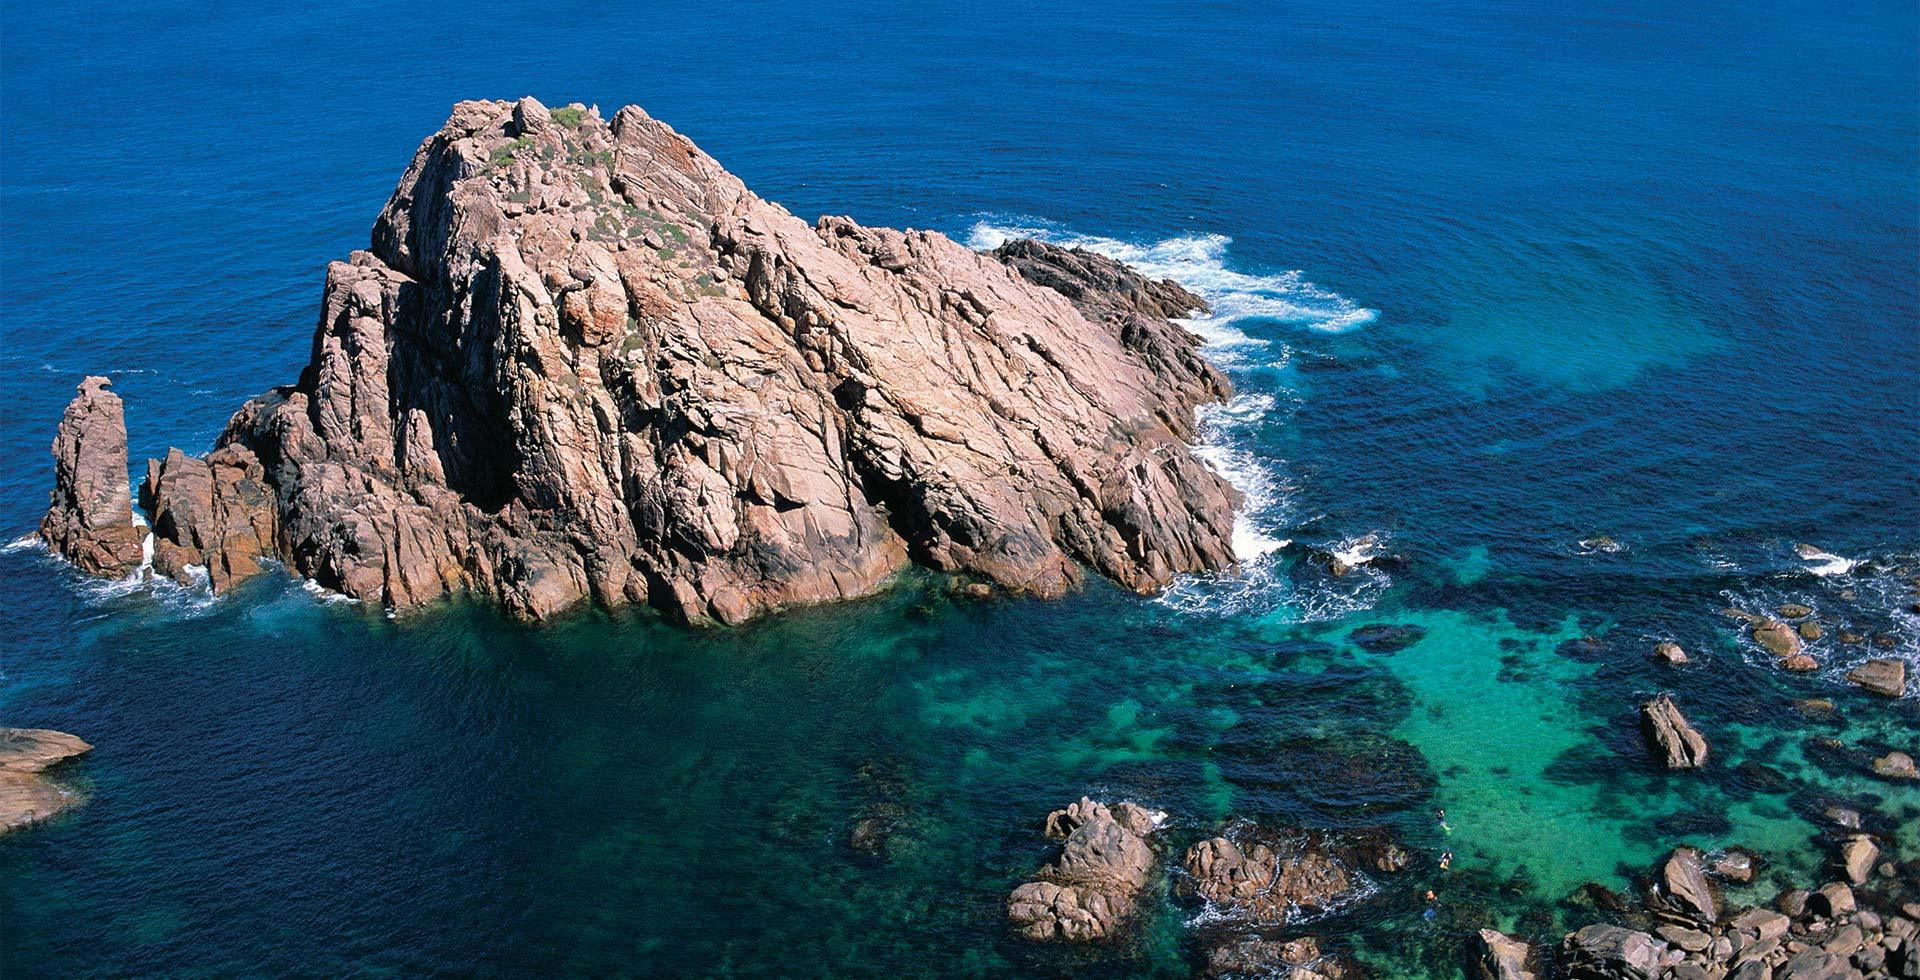 Visit the spectacular Sugarloaf Rock in Yallingup